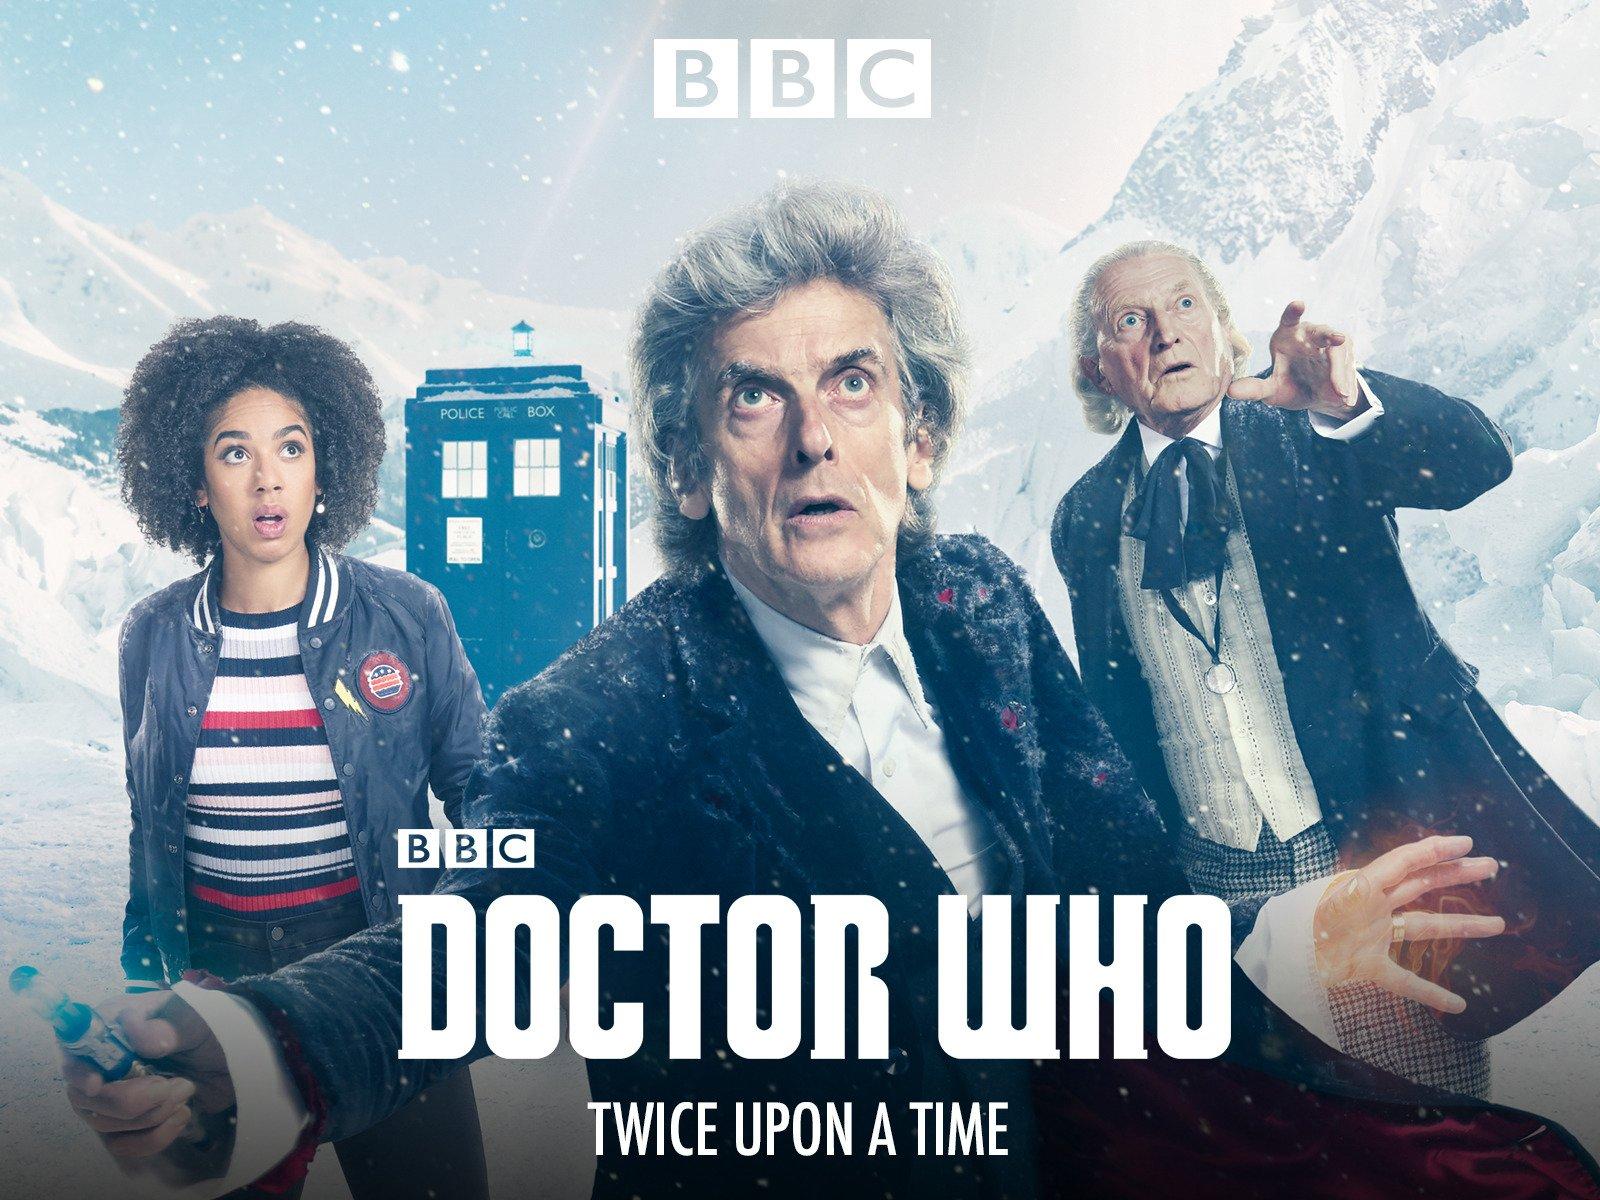 Amazon.com: Doctor Who: Twice Upon a Time: Peter Capaldi, David ...